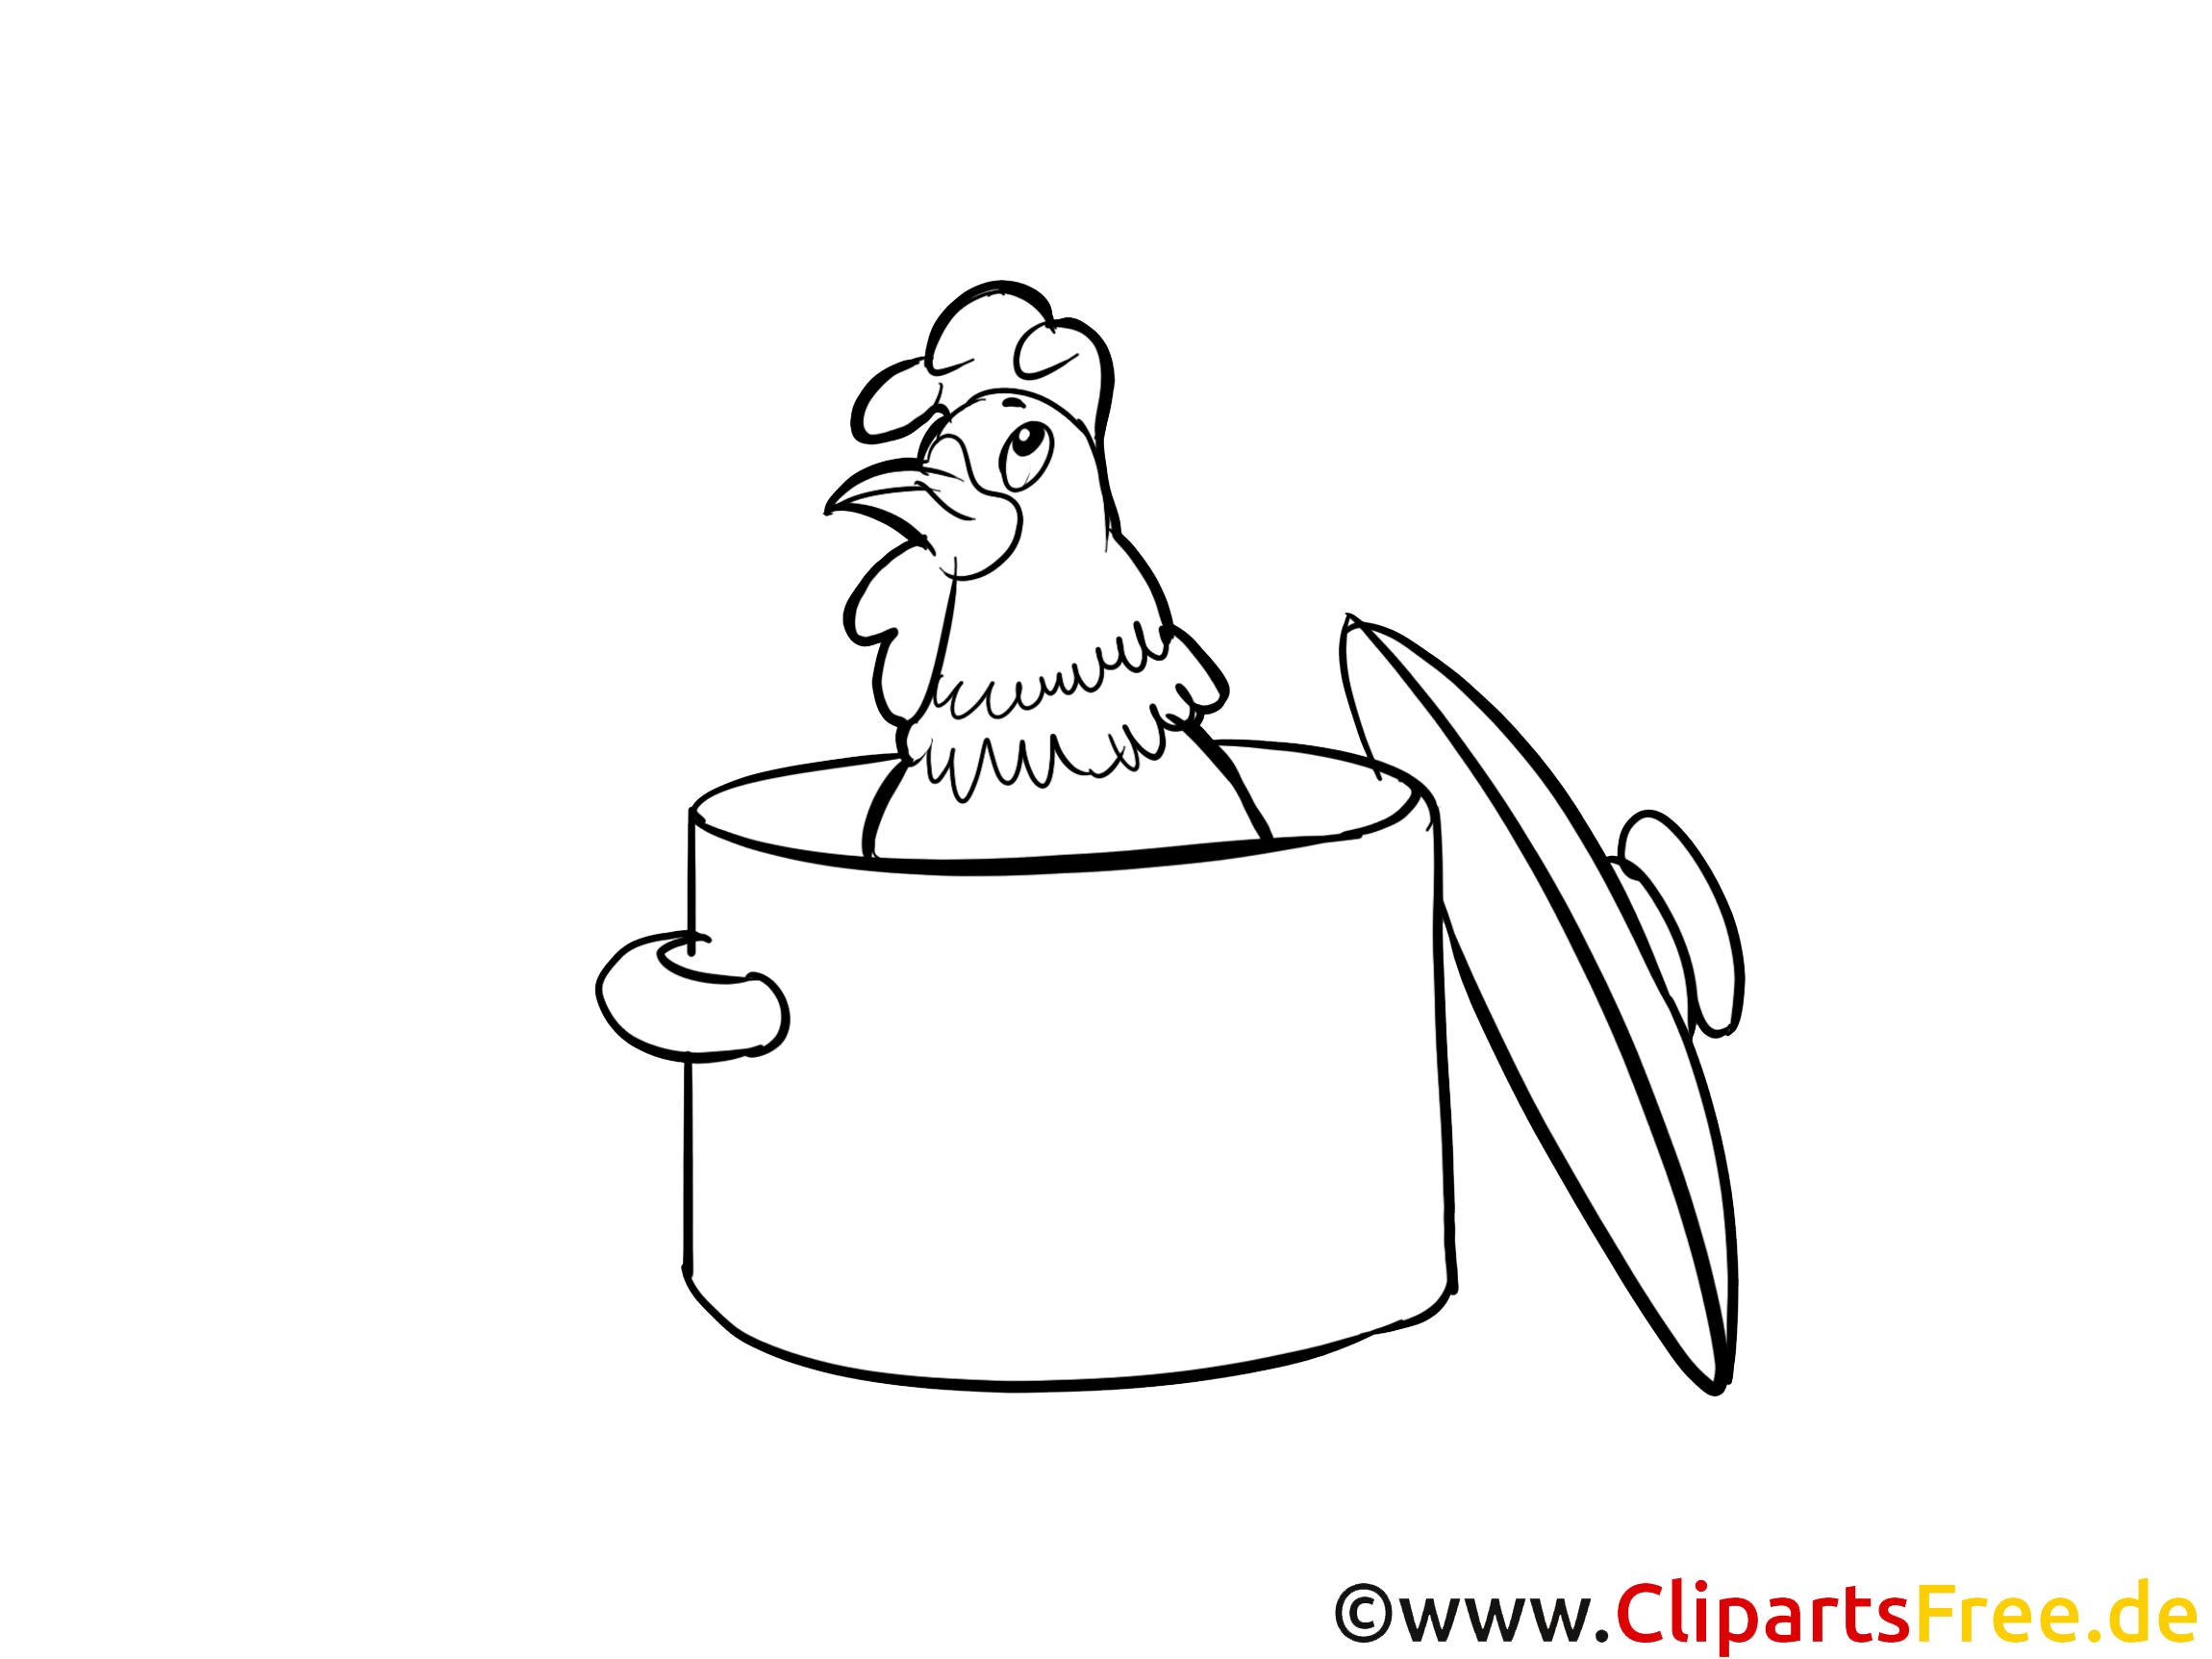 Huhn im Topf Bild-Malvorlage